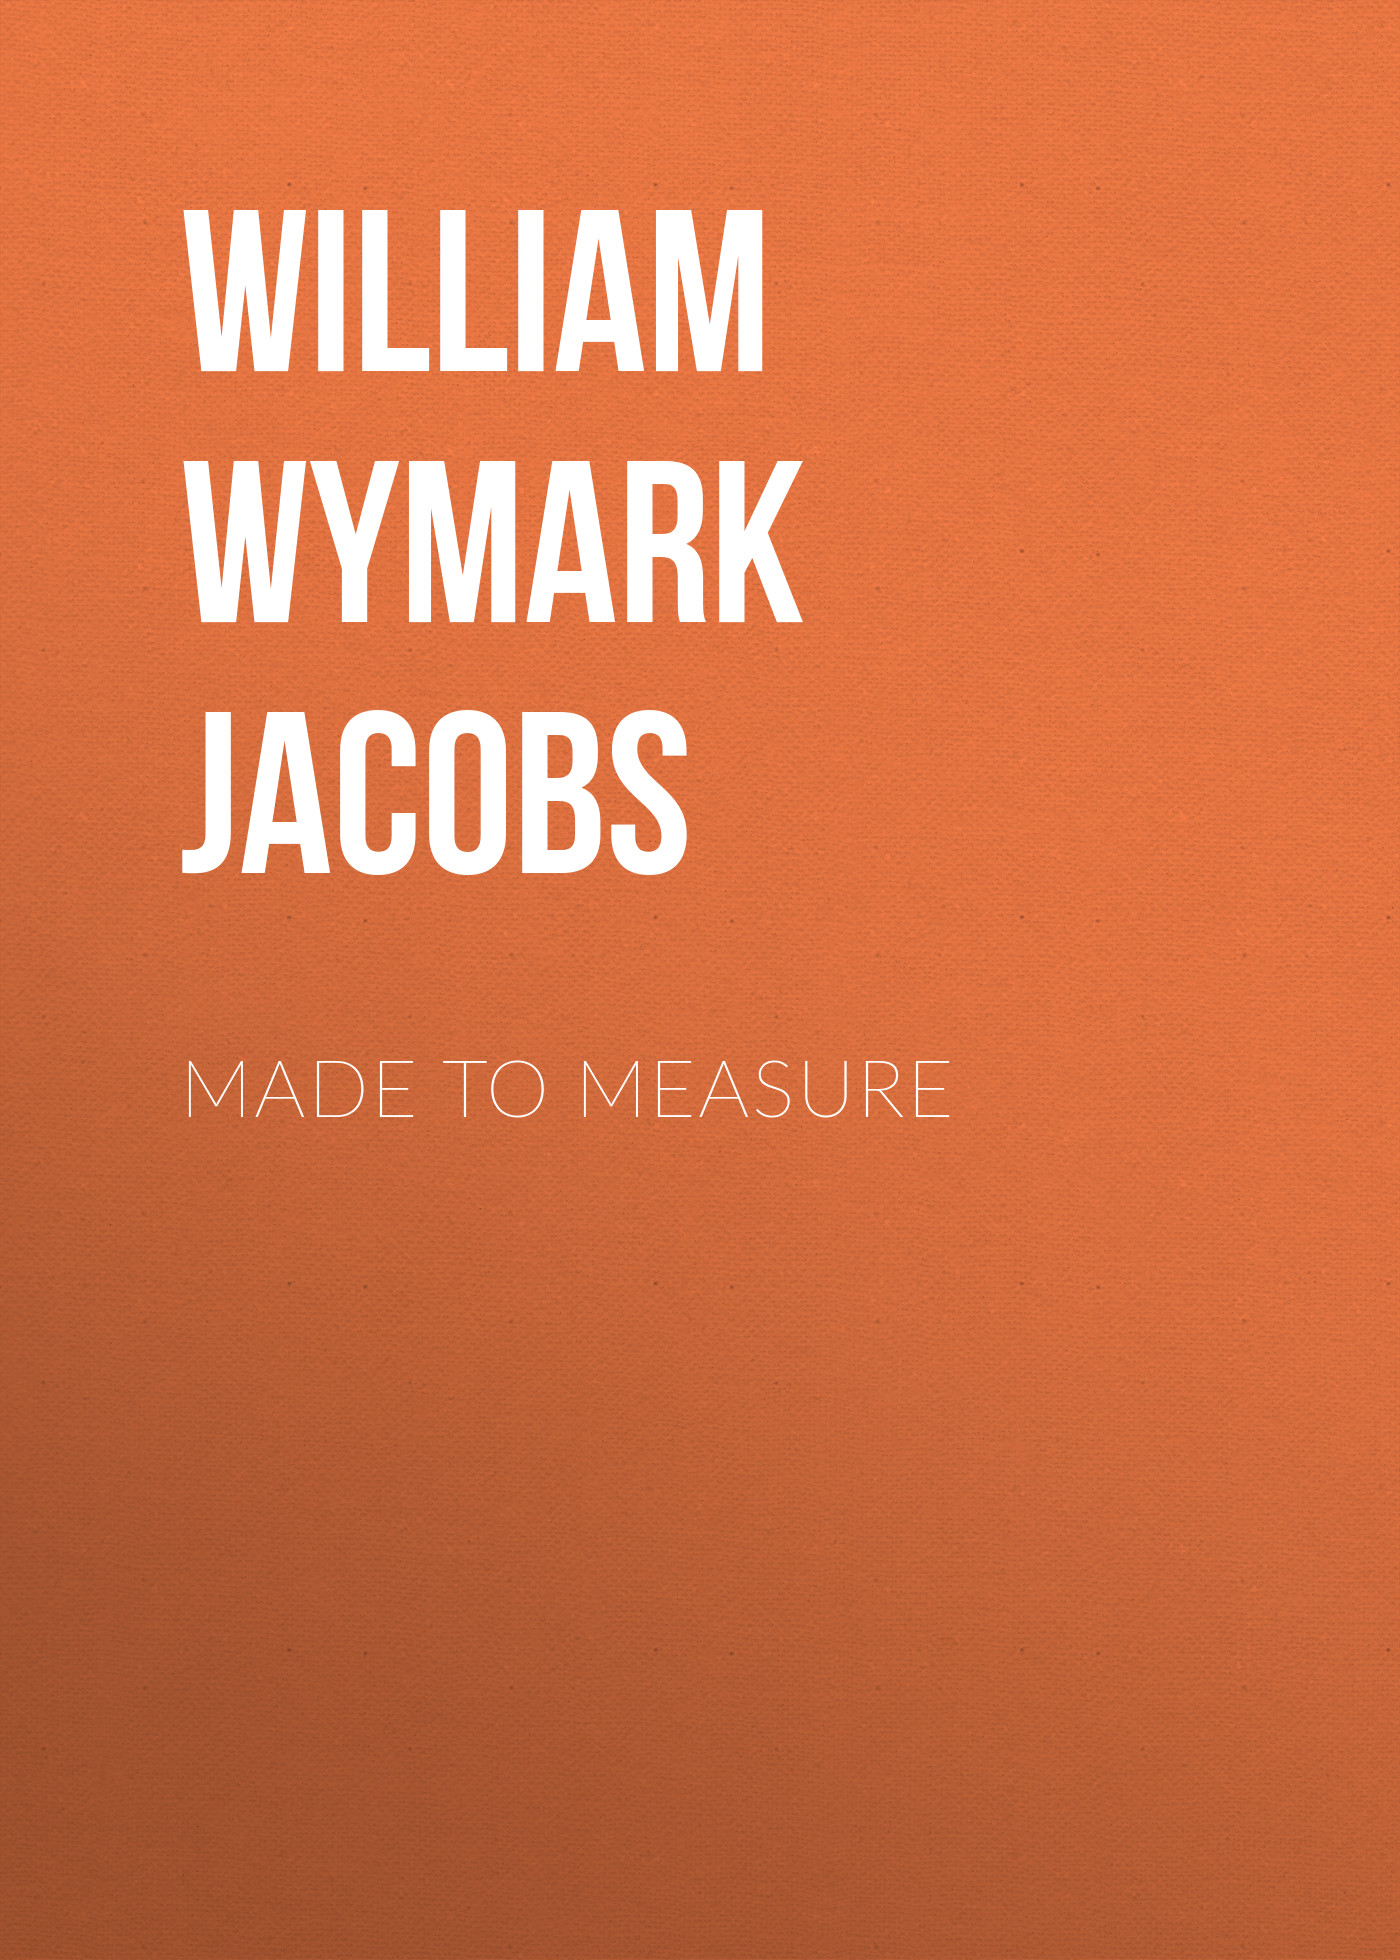 лучшая цена William Wymark Jacobs Made to Measure